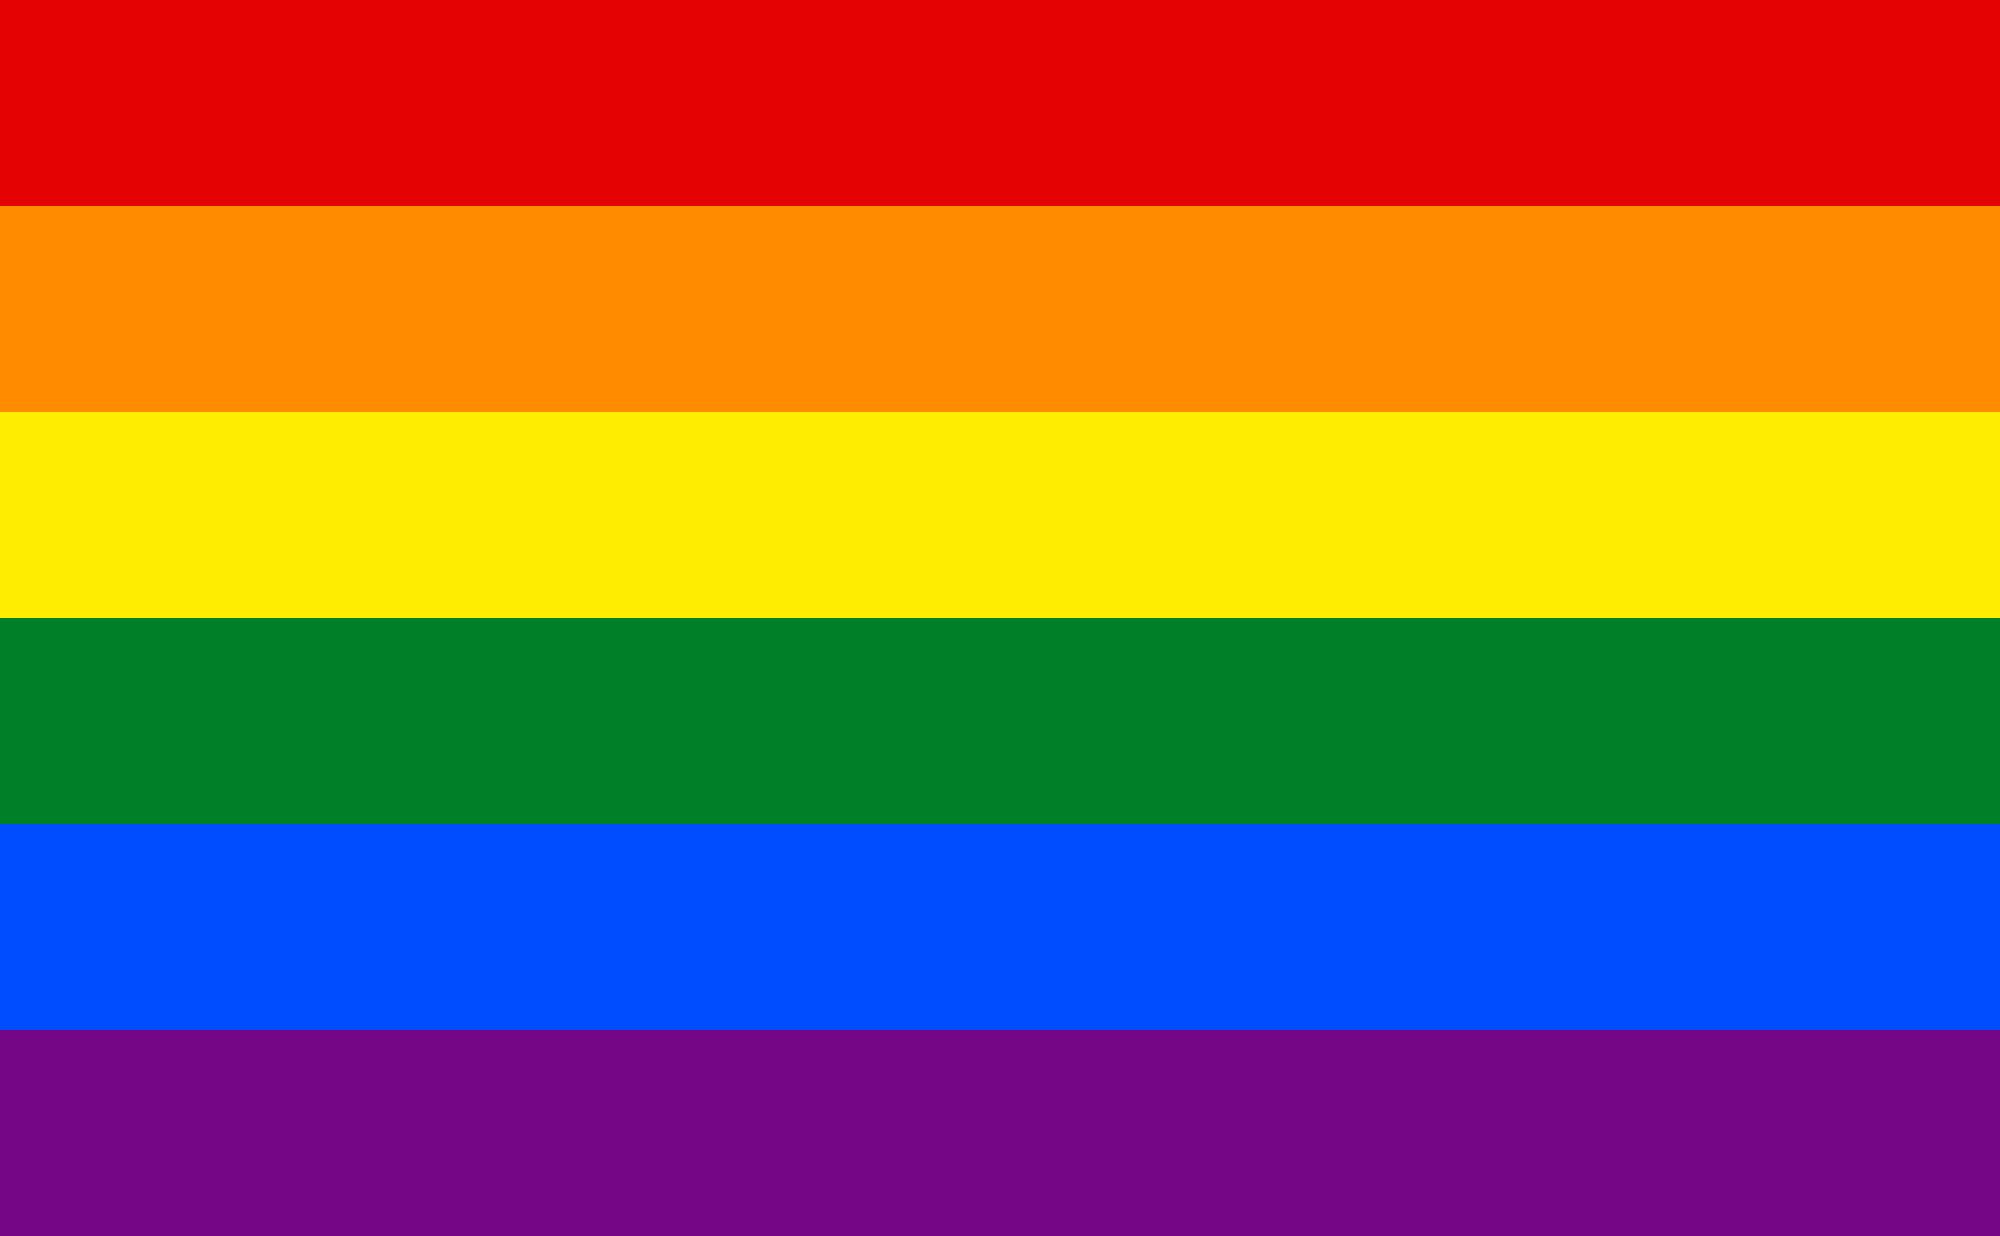 #LoveWins Tolerujemy Homoseksualistów